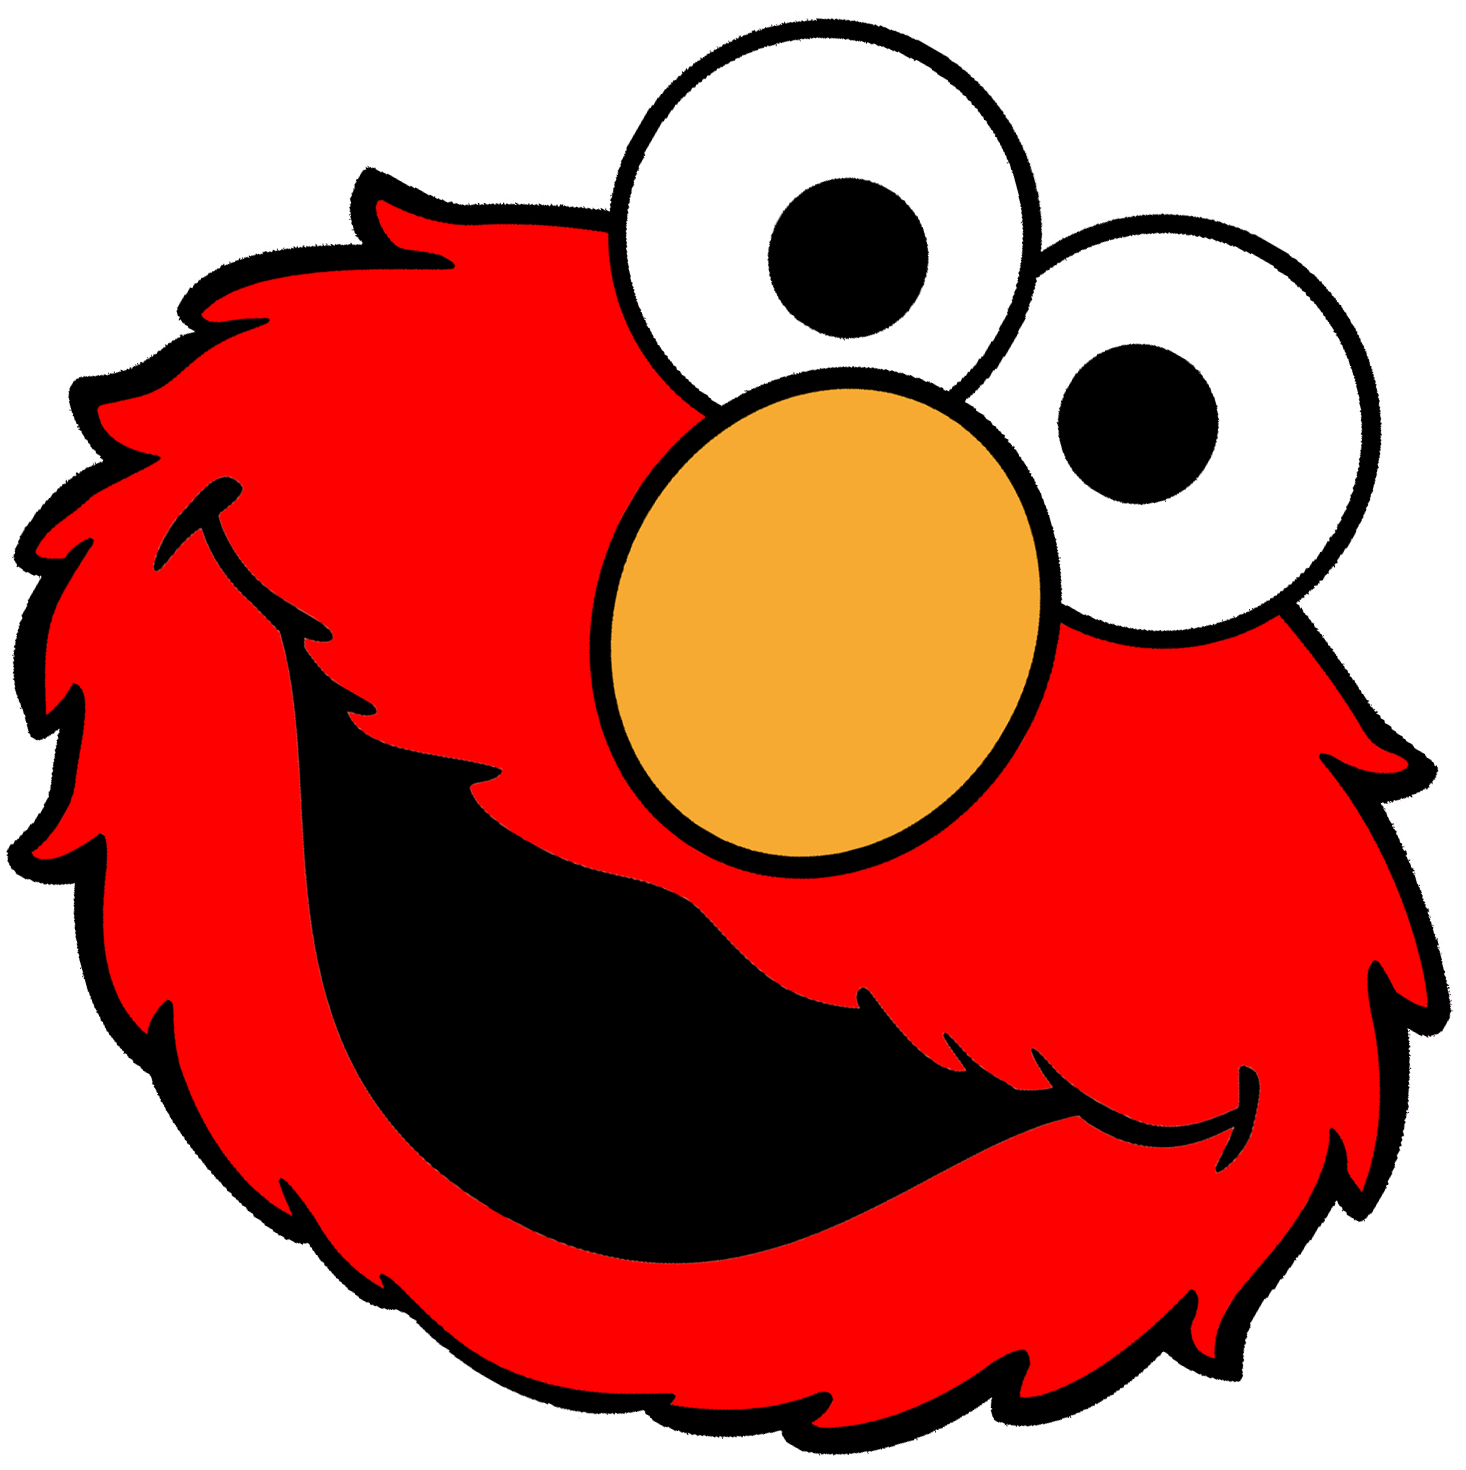 Imagenes De Elmo, 4K Ultra HD #QZ136 (Mobile And Desktop) Pictures